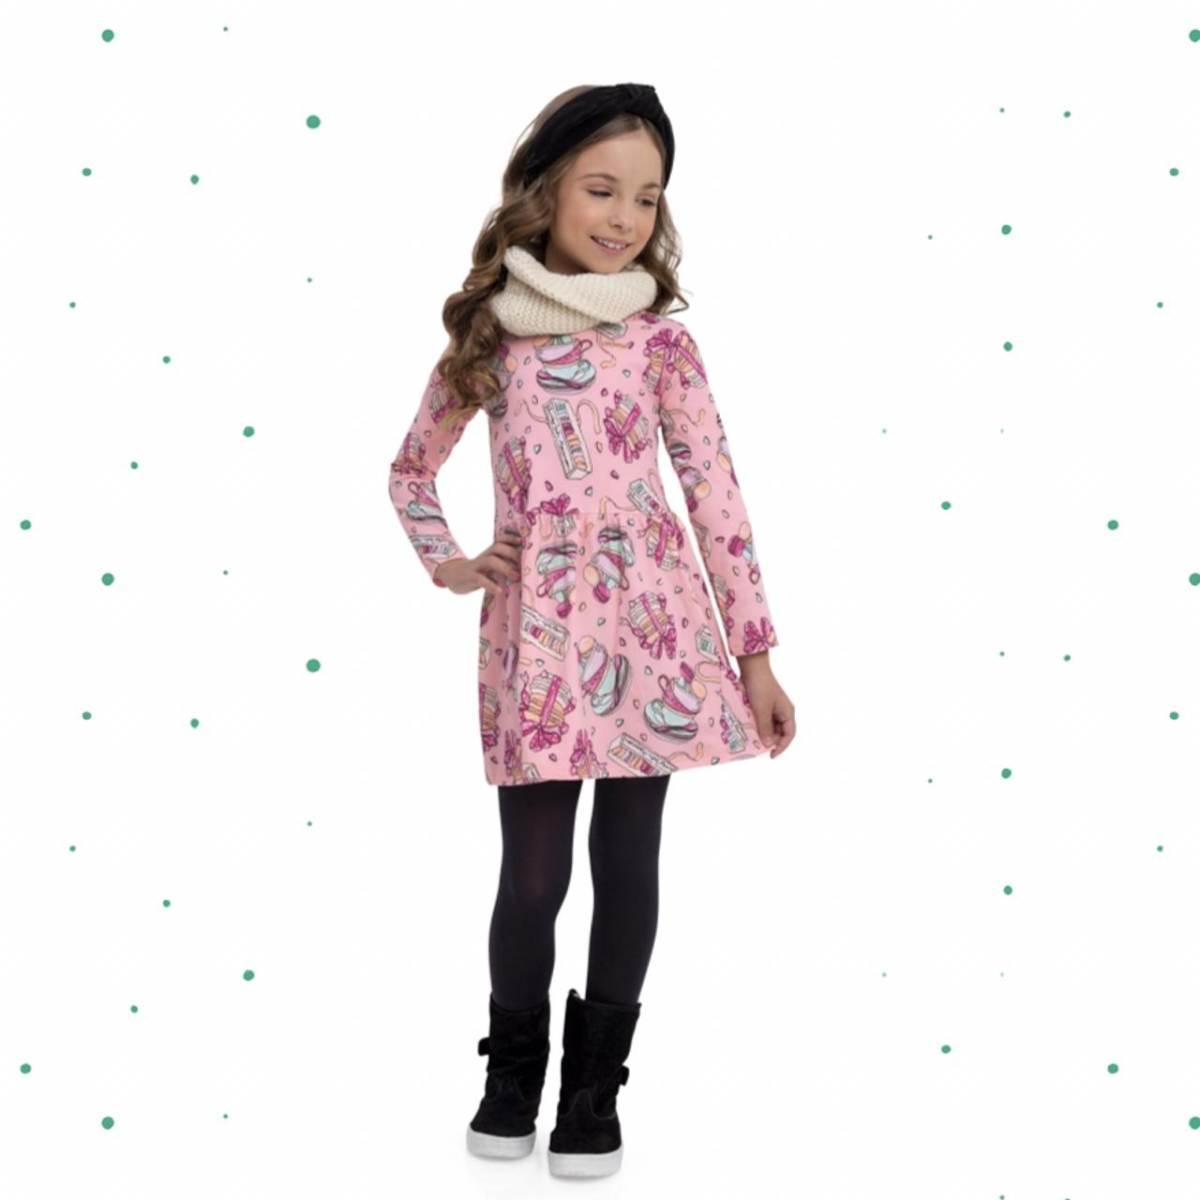 Vestido Infantil Quimby em Cotton